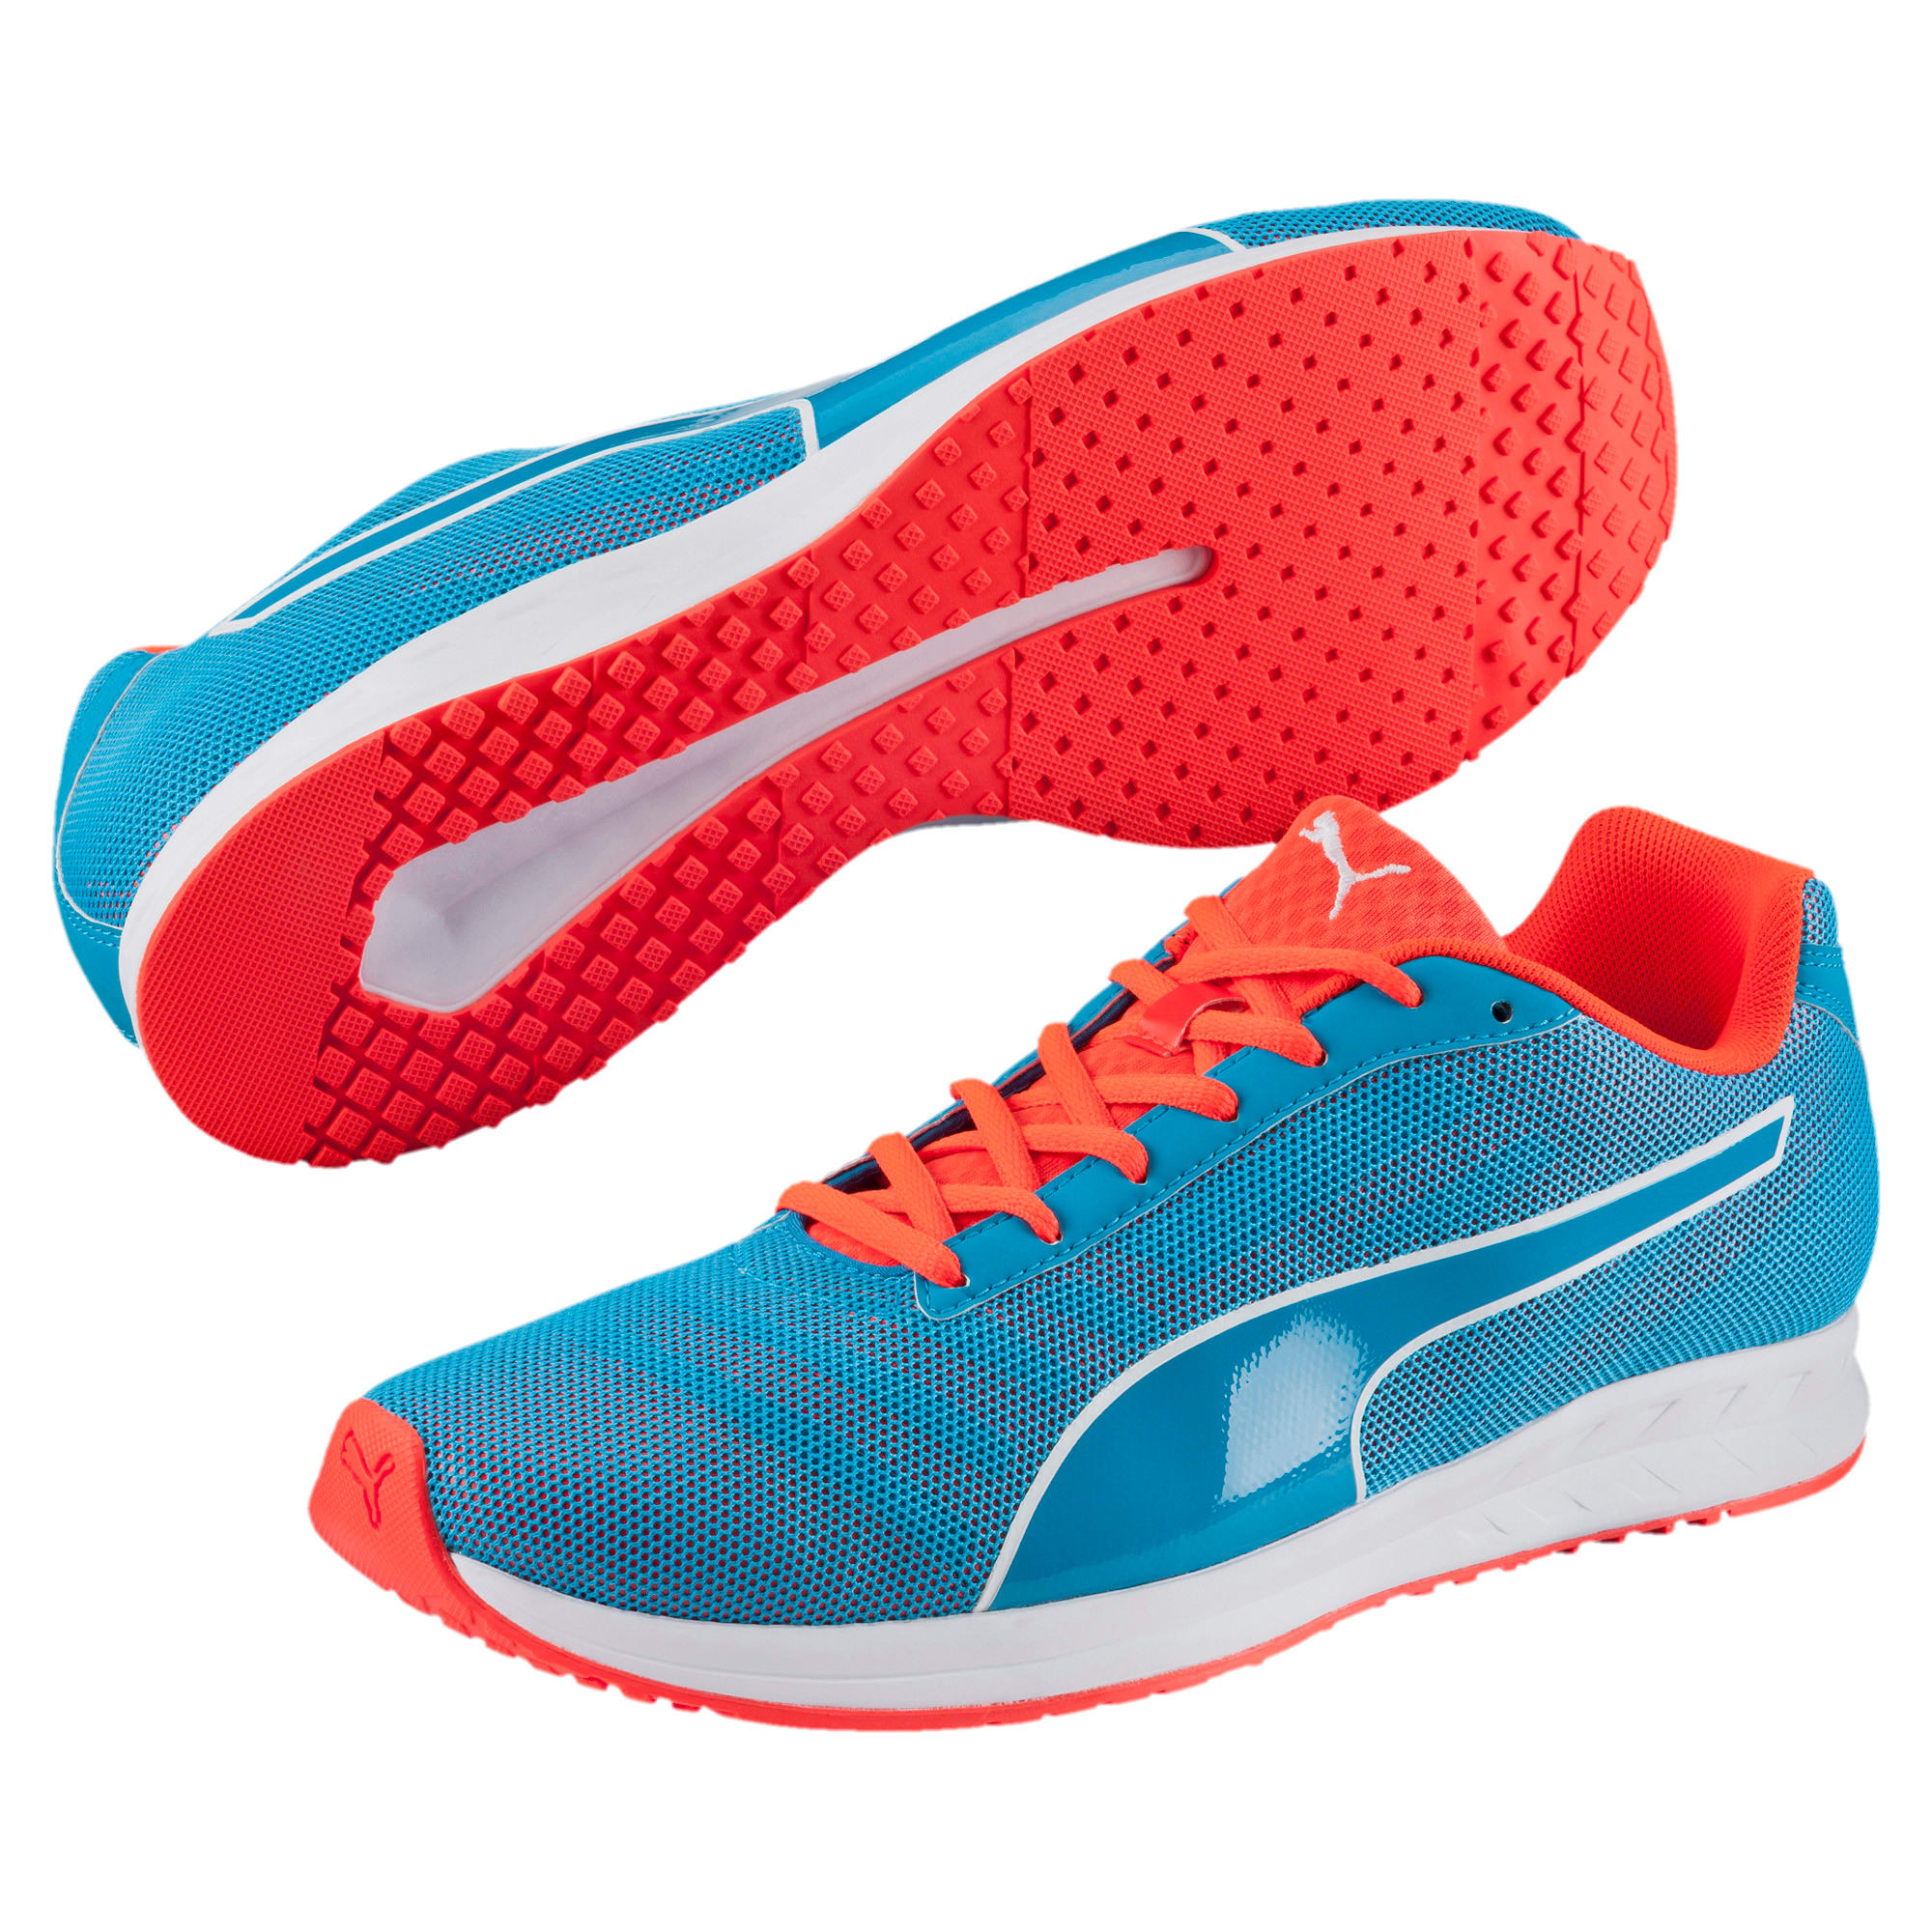 Thumbnail 2 of Burst Running Shoes, atomic blue-red blast, medium-IND